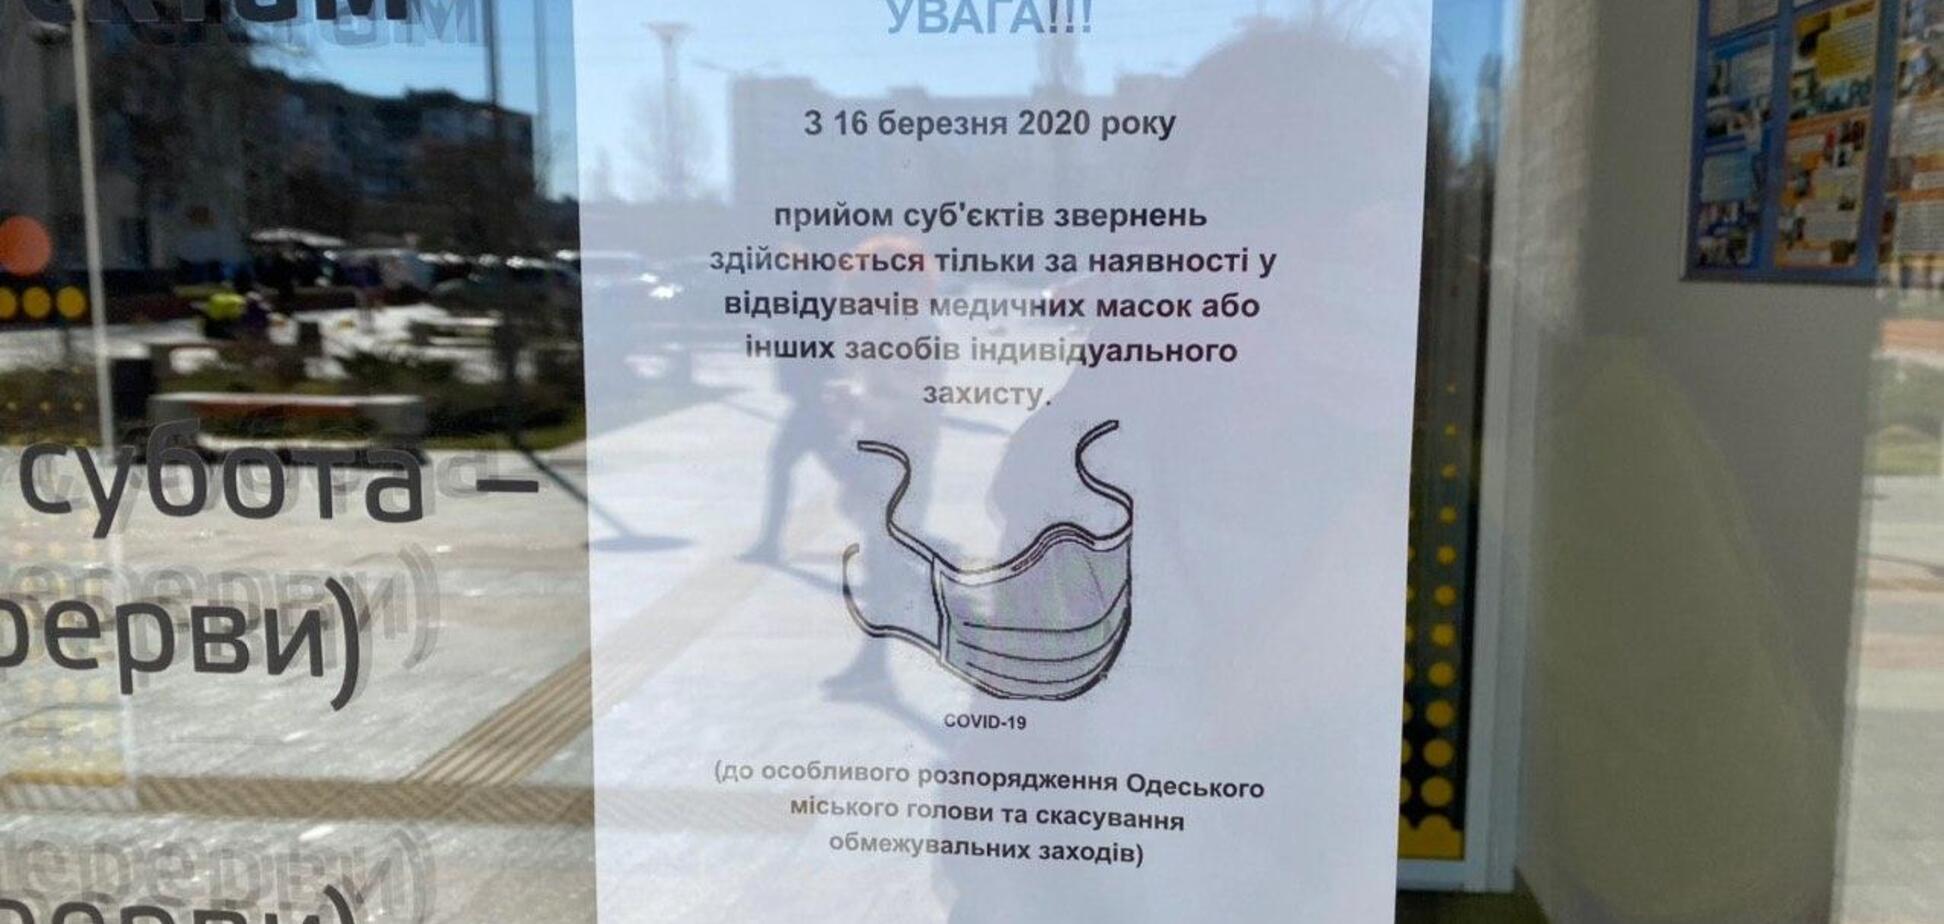 Карантин в Одессе: как живет город в ожидании коронавируса. Фото